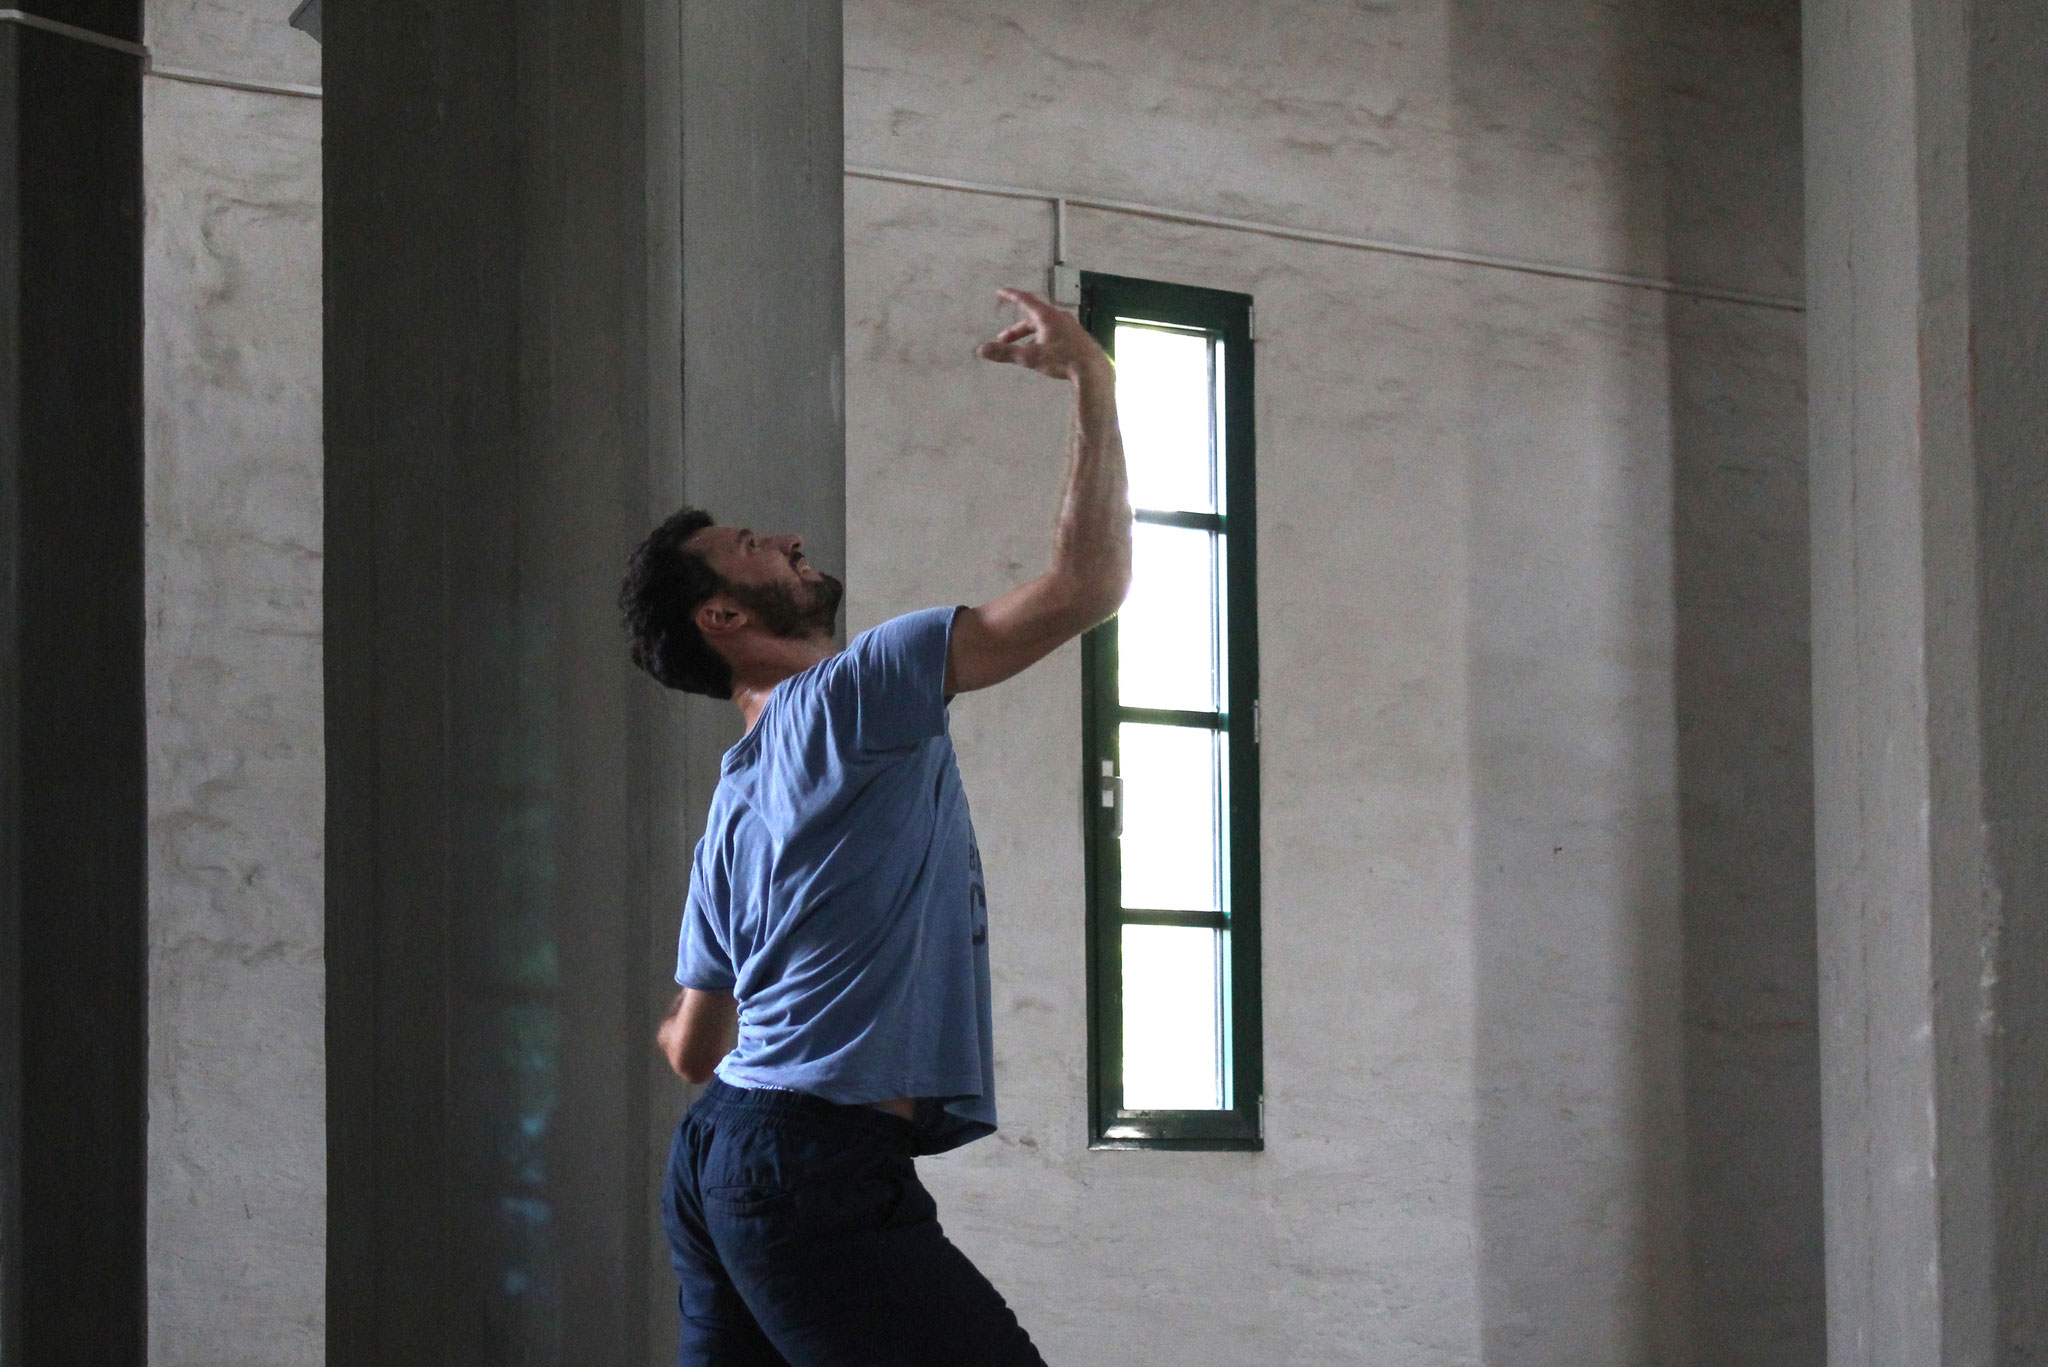 Probenschnappschuss Isaac Araujo im Wasserturm Süd (Foto: Stephanie Därr)